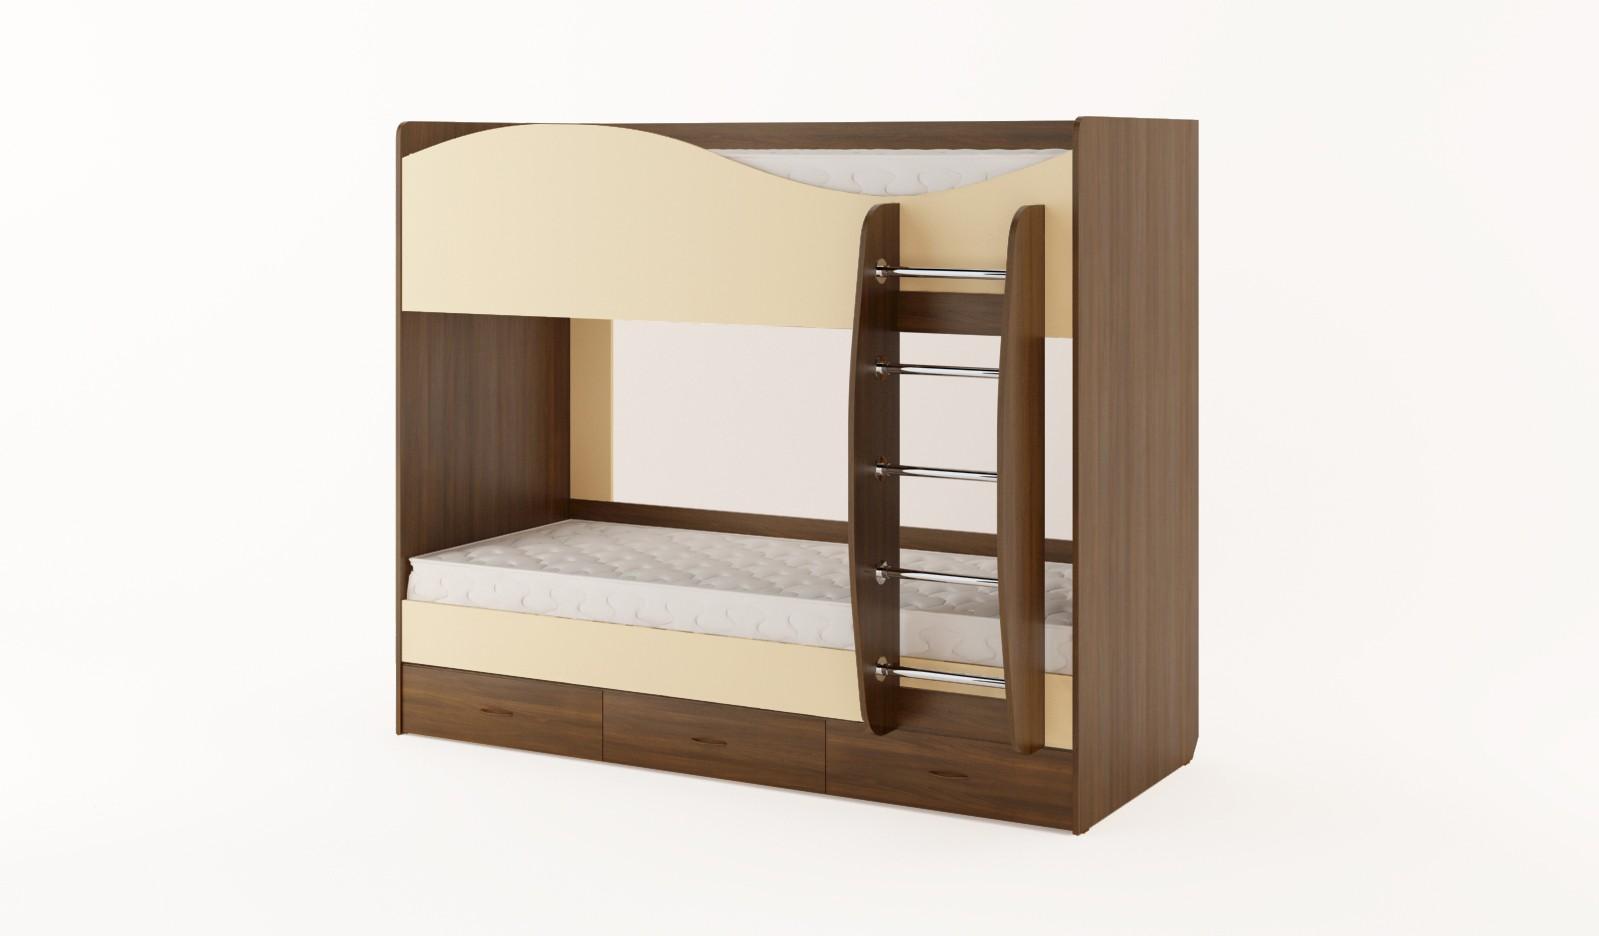 Двухъярусные кровати корпусные